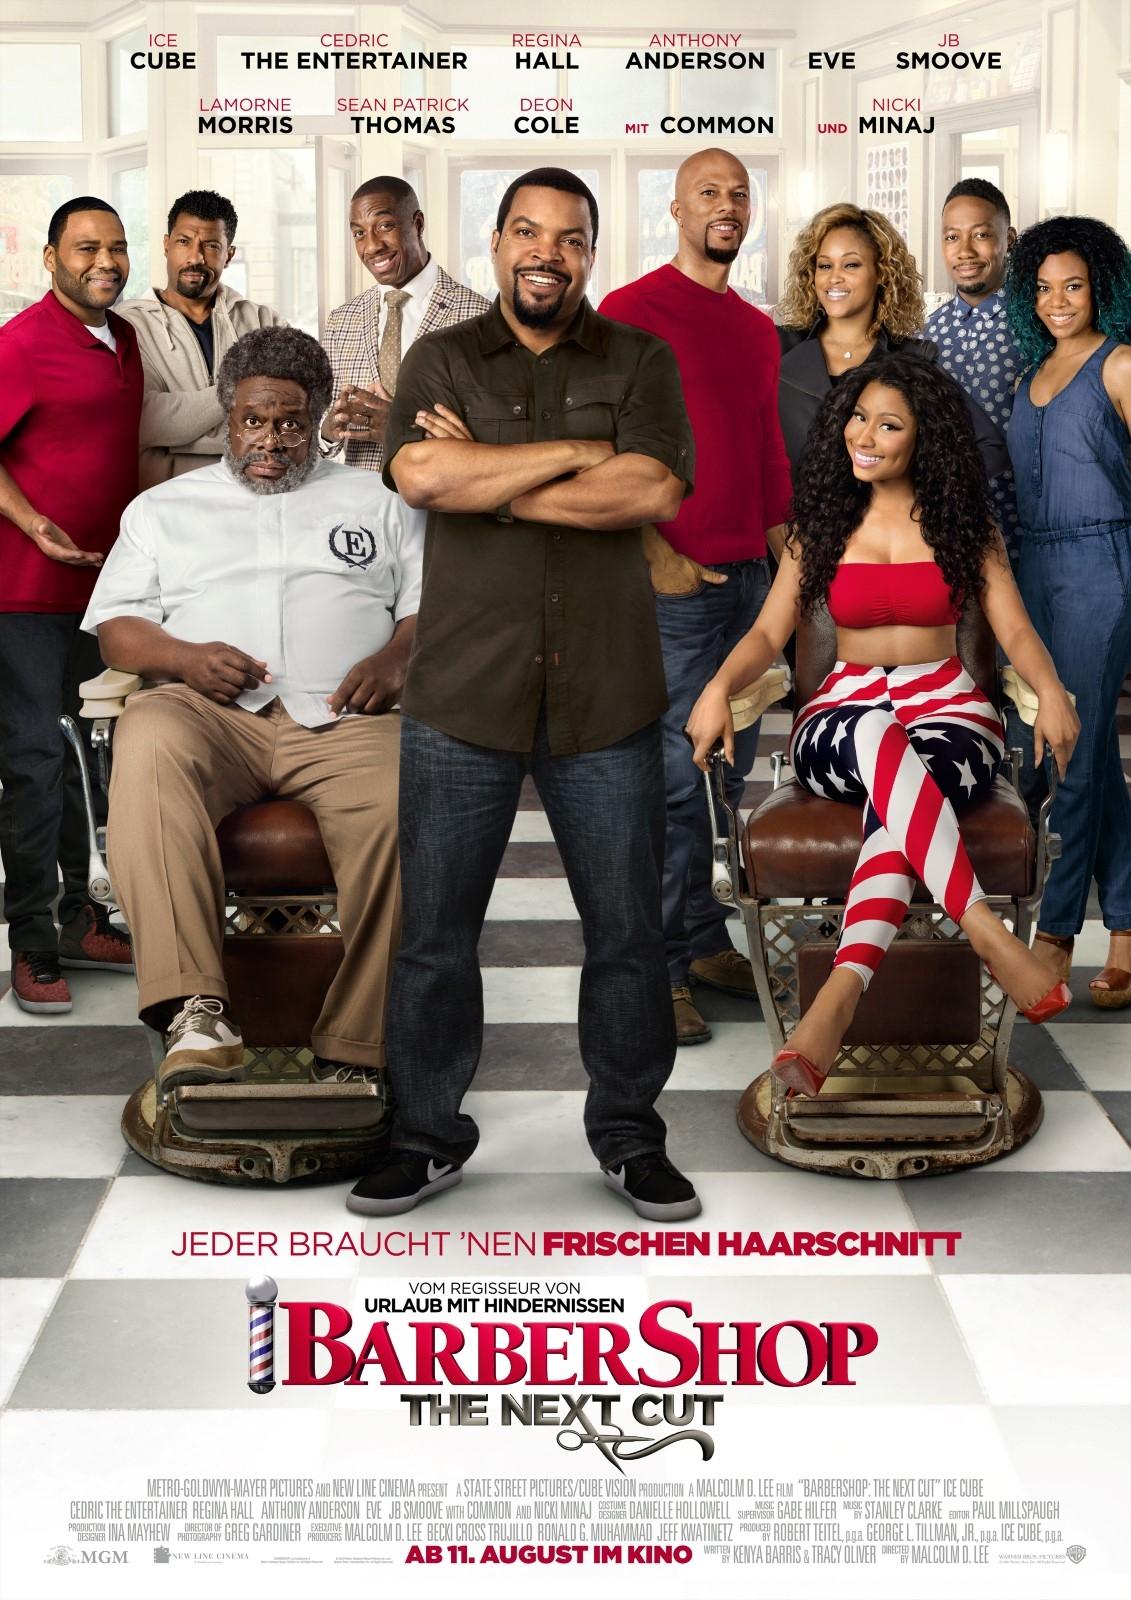 Barbershop: The Next Cut (Poster)